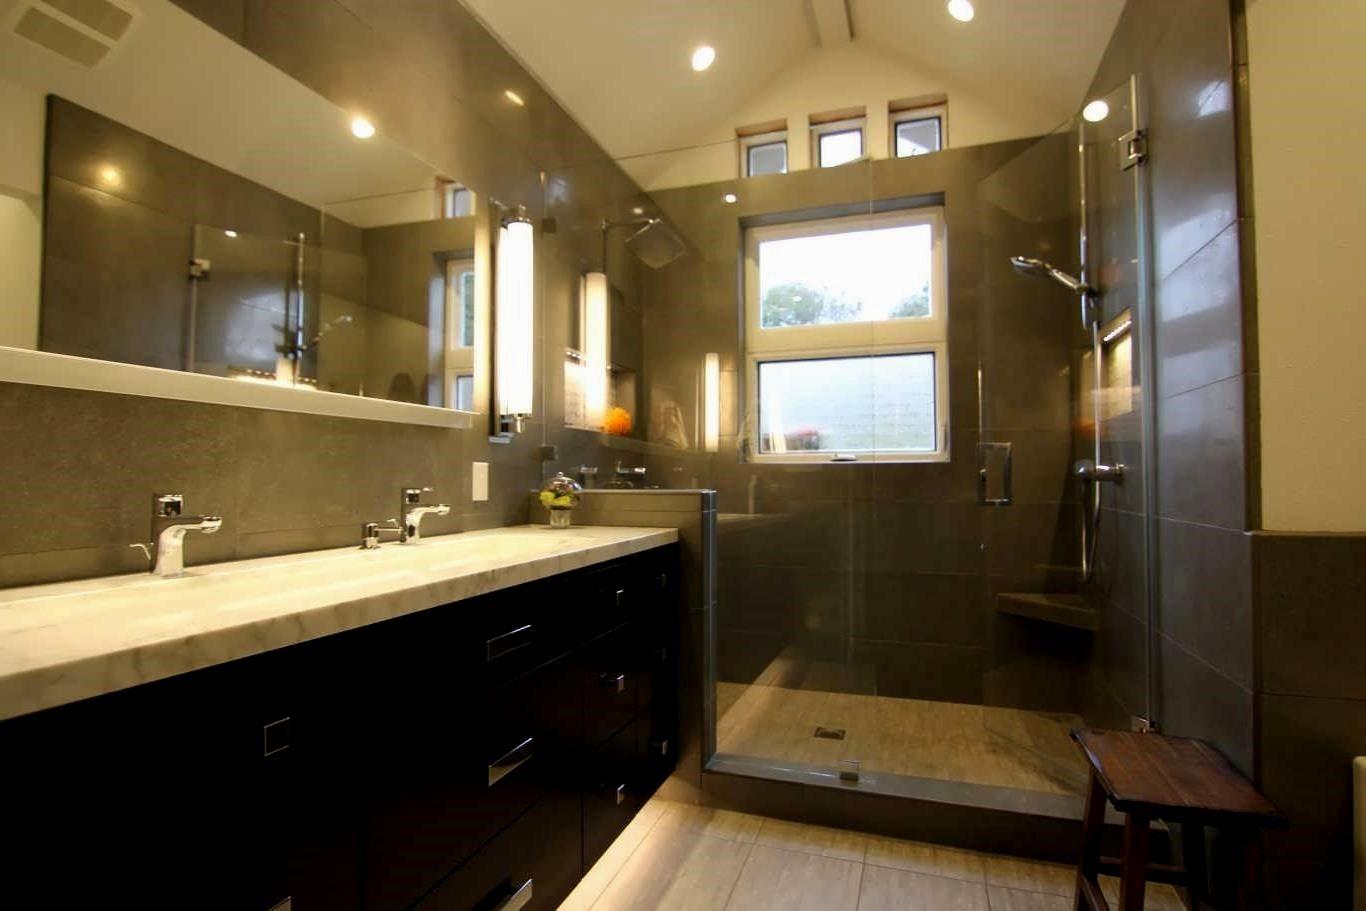 top double sink bathroom vanity gallery-Excellent Double Sink Bathroom Vanity Décor